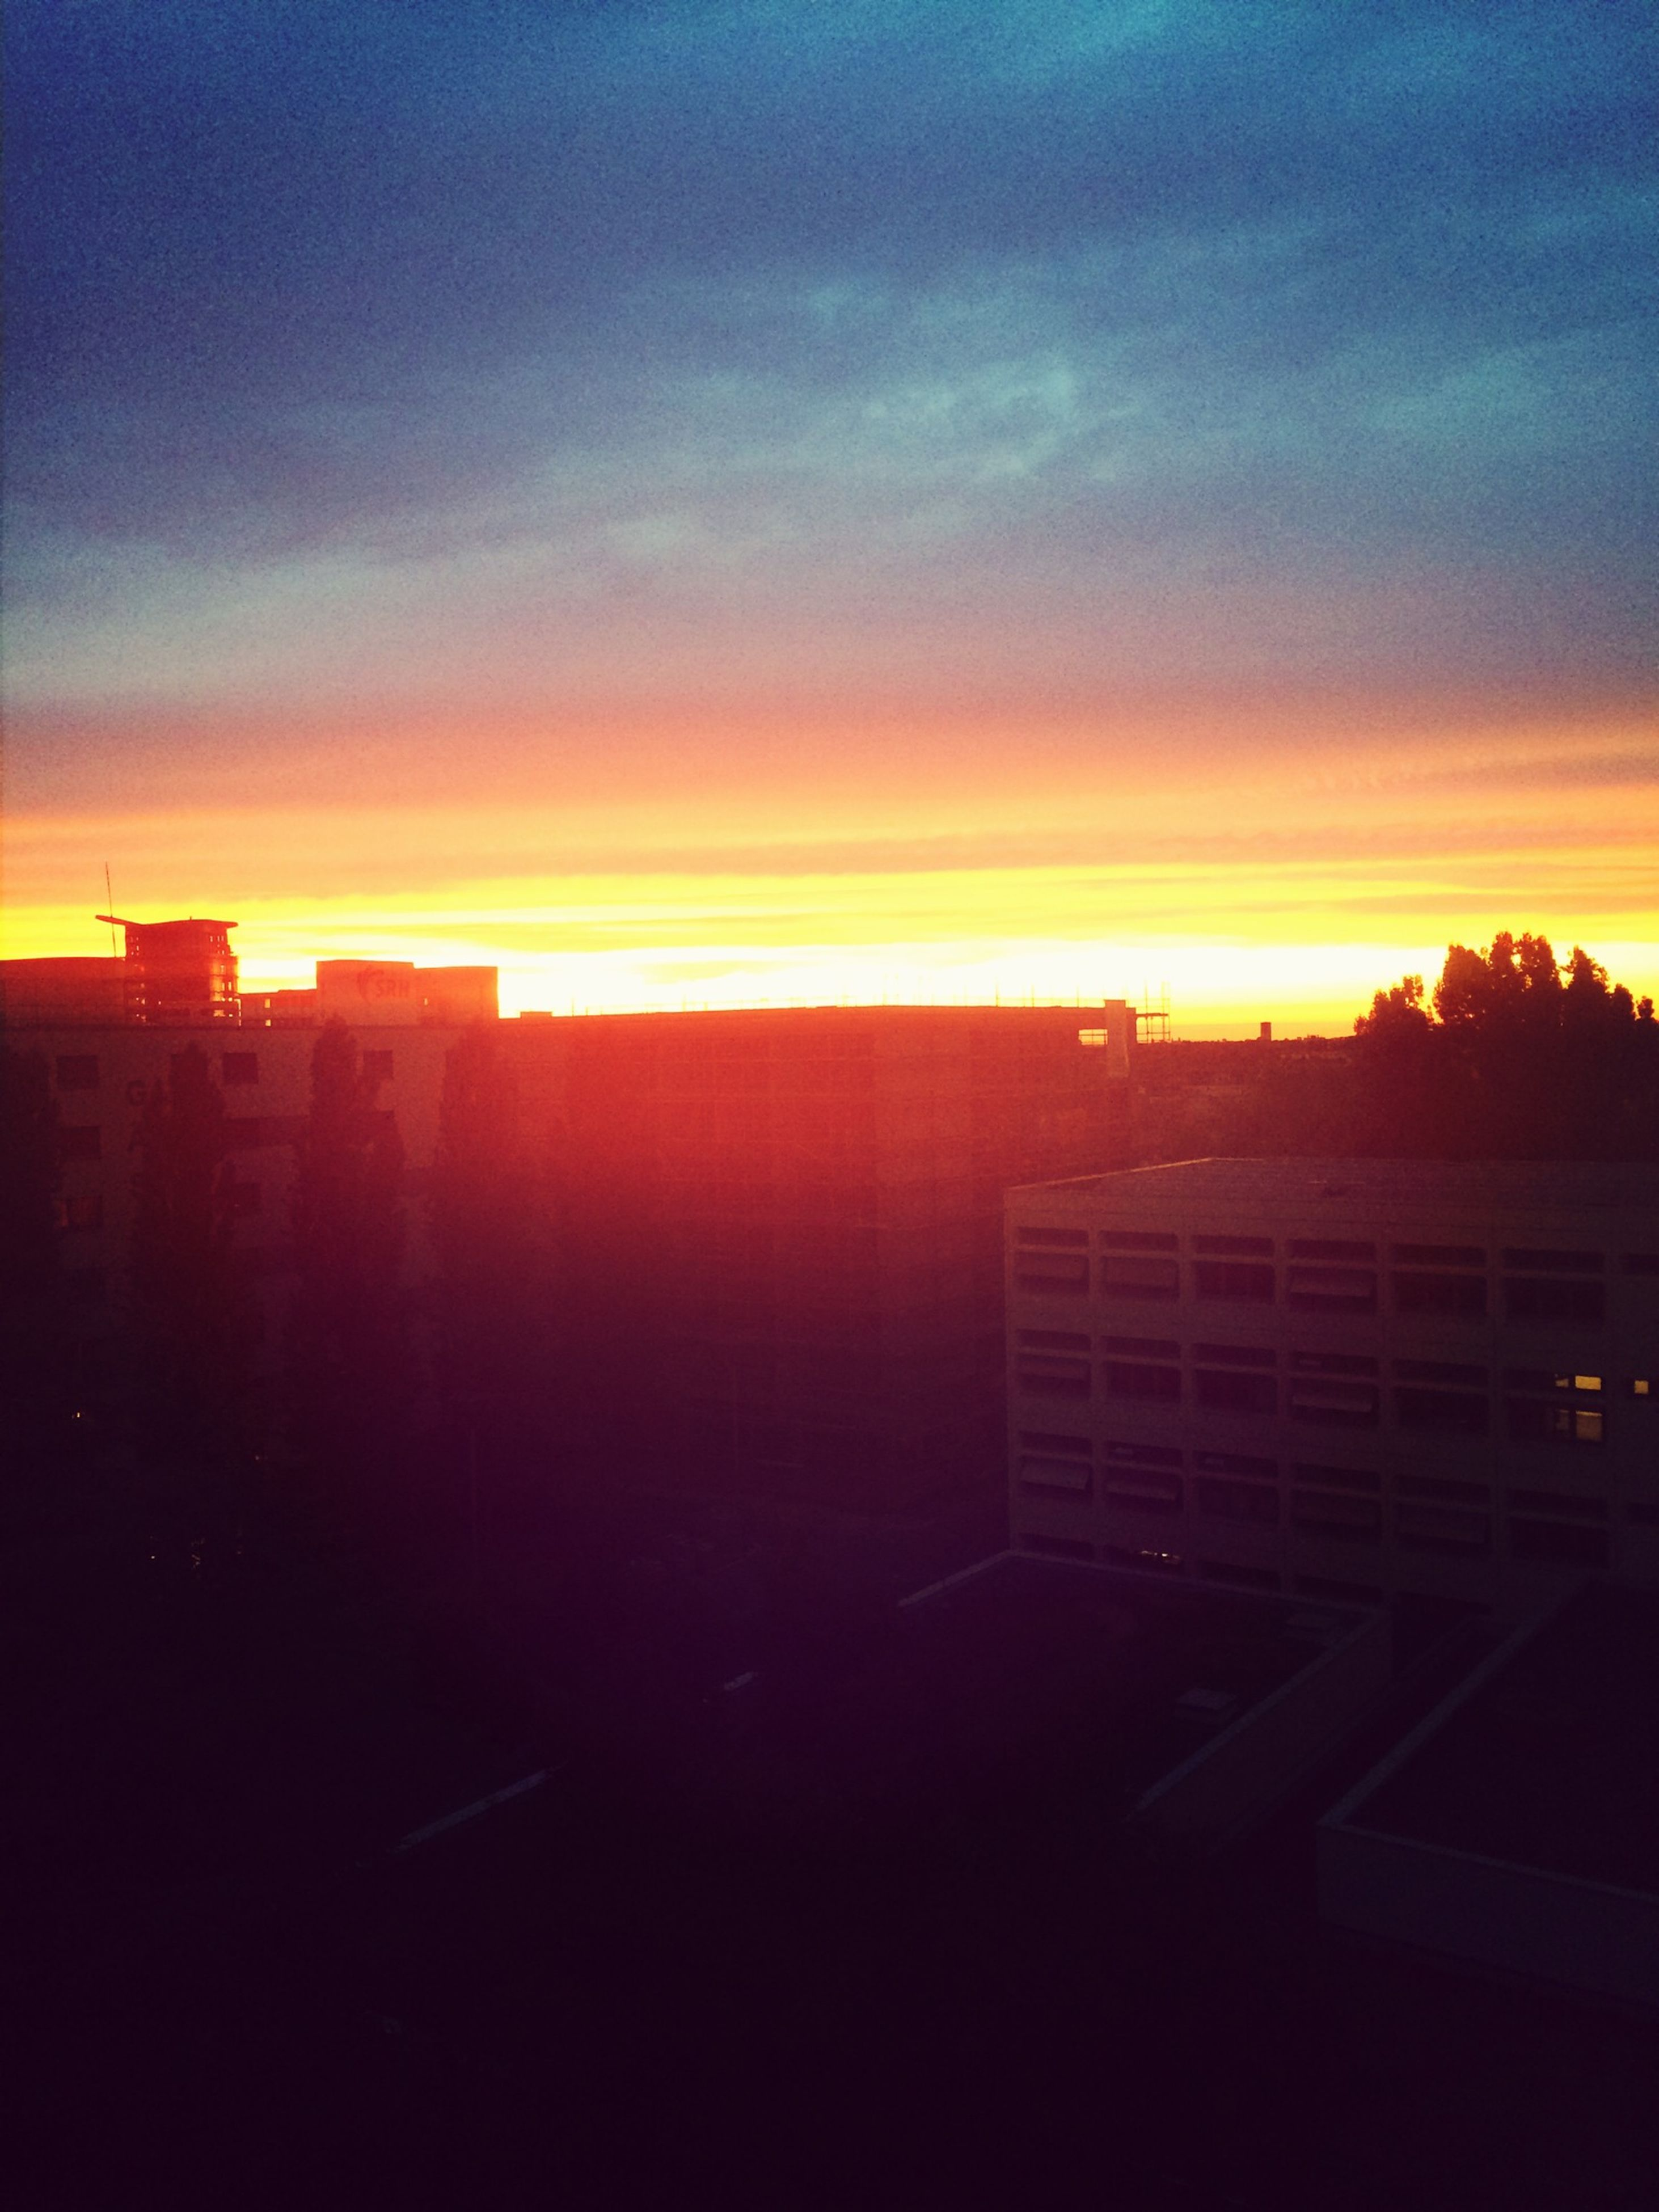 sunset, sun, building exterior, orange color, architecture, sky, built structure, cloud - sky, silhouette, city, sunlight, sunbeam, scenics, beauty in nature, nature, no people, cloud, lens flare, outdoors, residential building